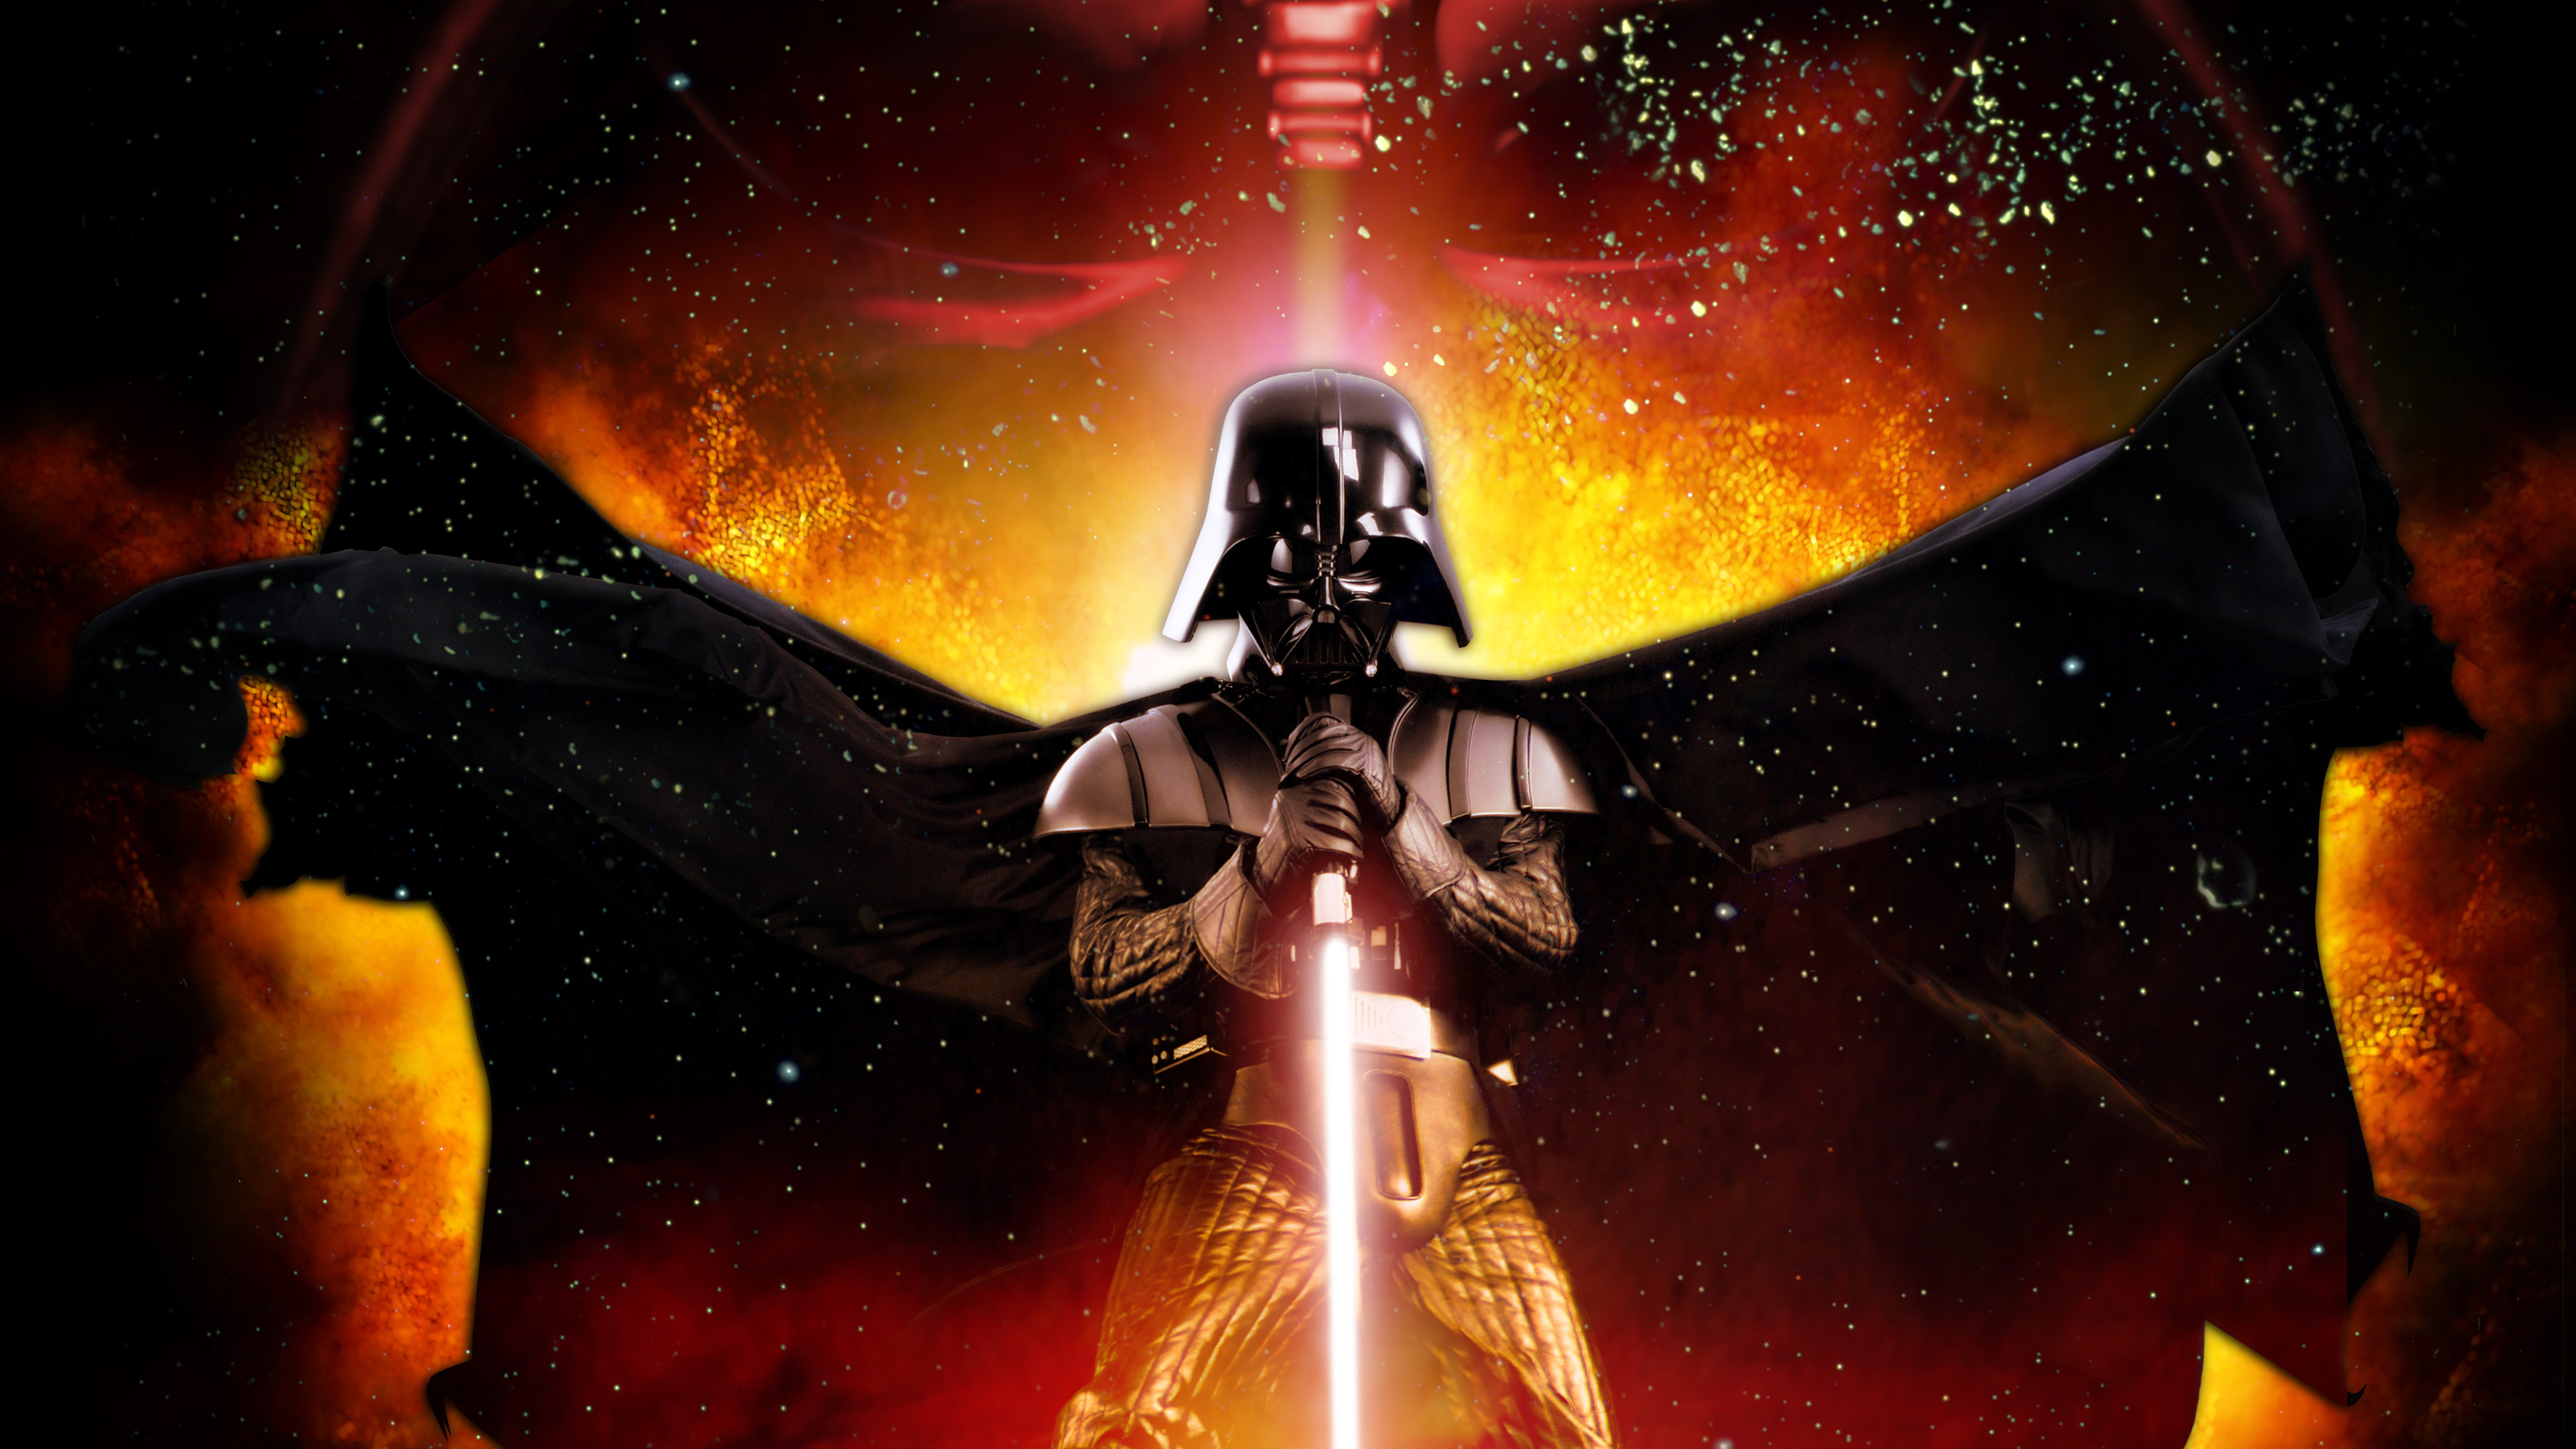 Star Wars 4k Ultra Hd Wallpaper Background Image 4200x2363 Id 1075892 Wallpaper Abyss